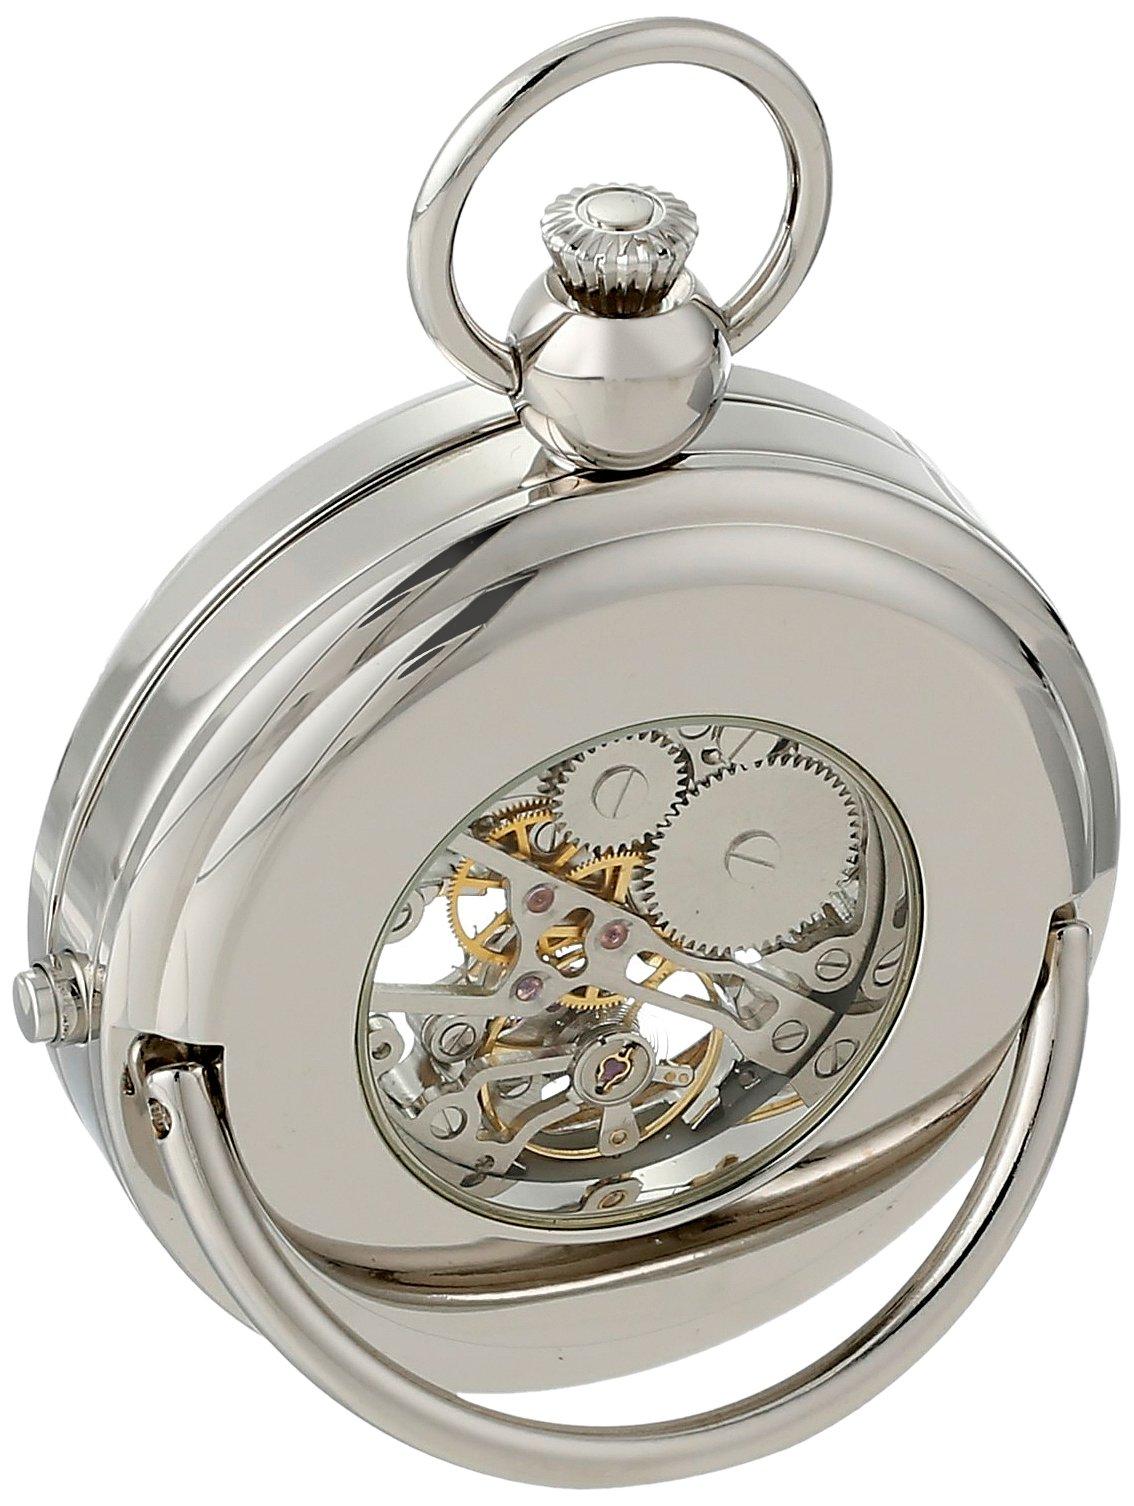 Charles Hubert 3849 Mechanical Picture Frame Pocket Watch by CHARLES-HUBERT PARIS (Image #3)